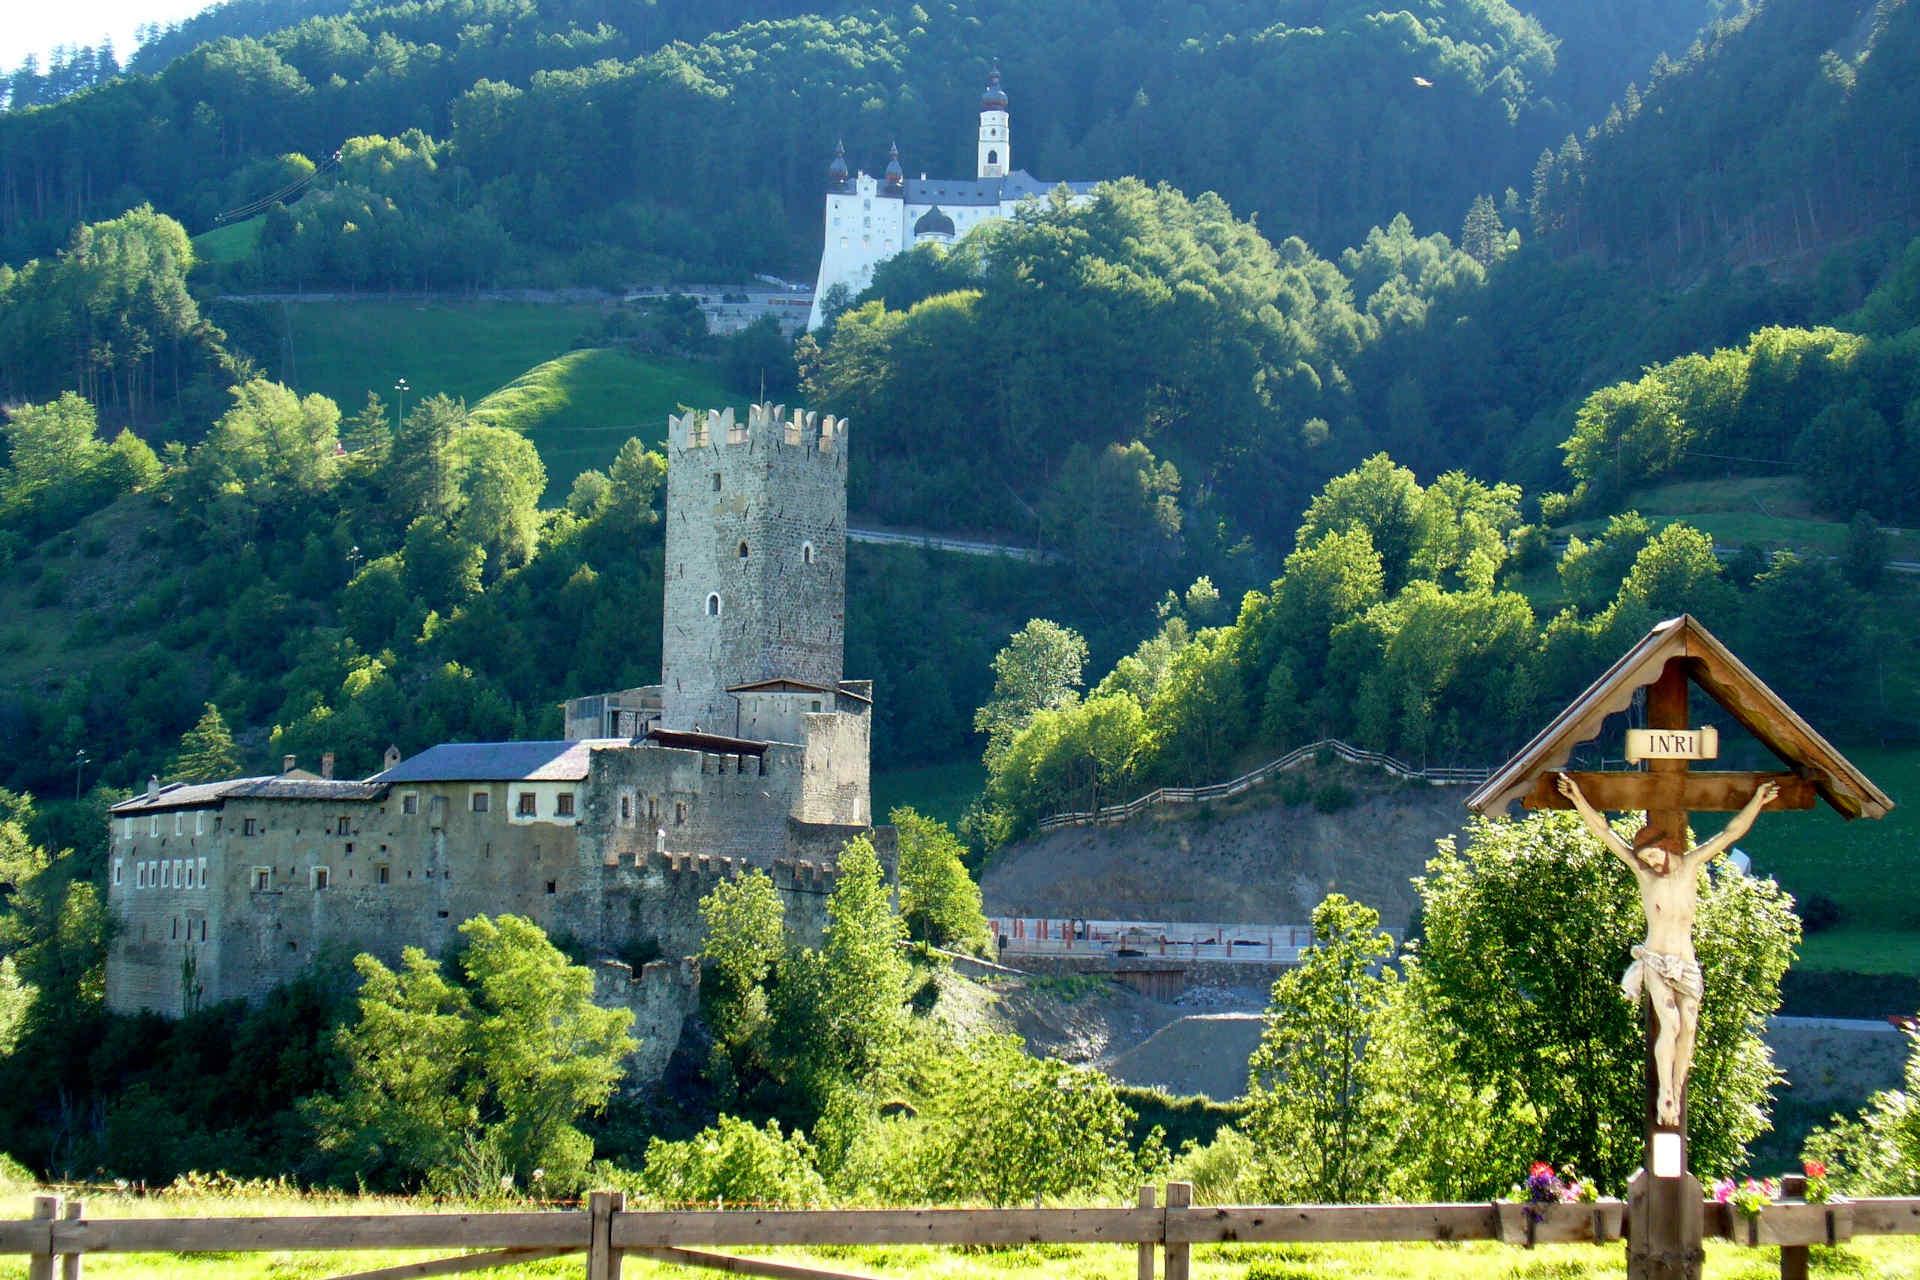 Benedictine abbey Marienberg Burgeis